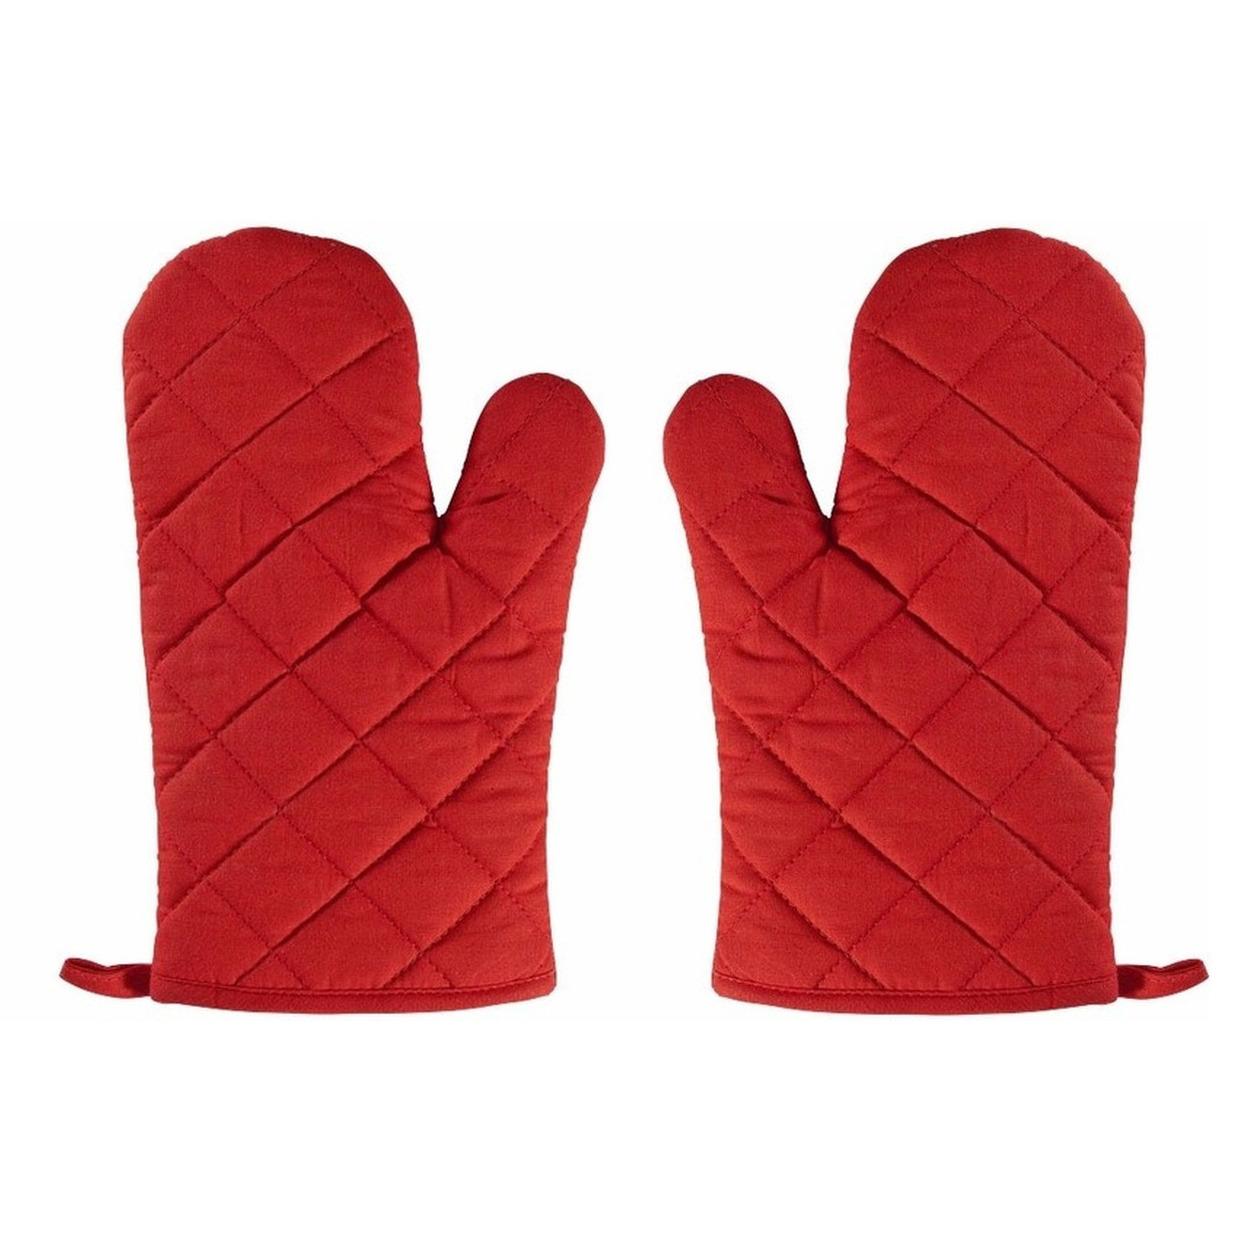 2x Rode ovenwanten-ovenhandschoenen keukentextiel